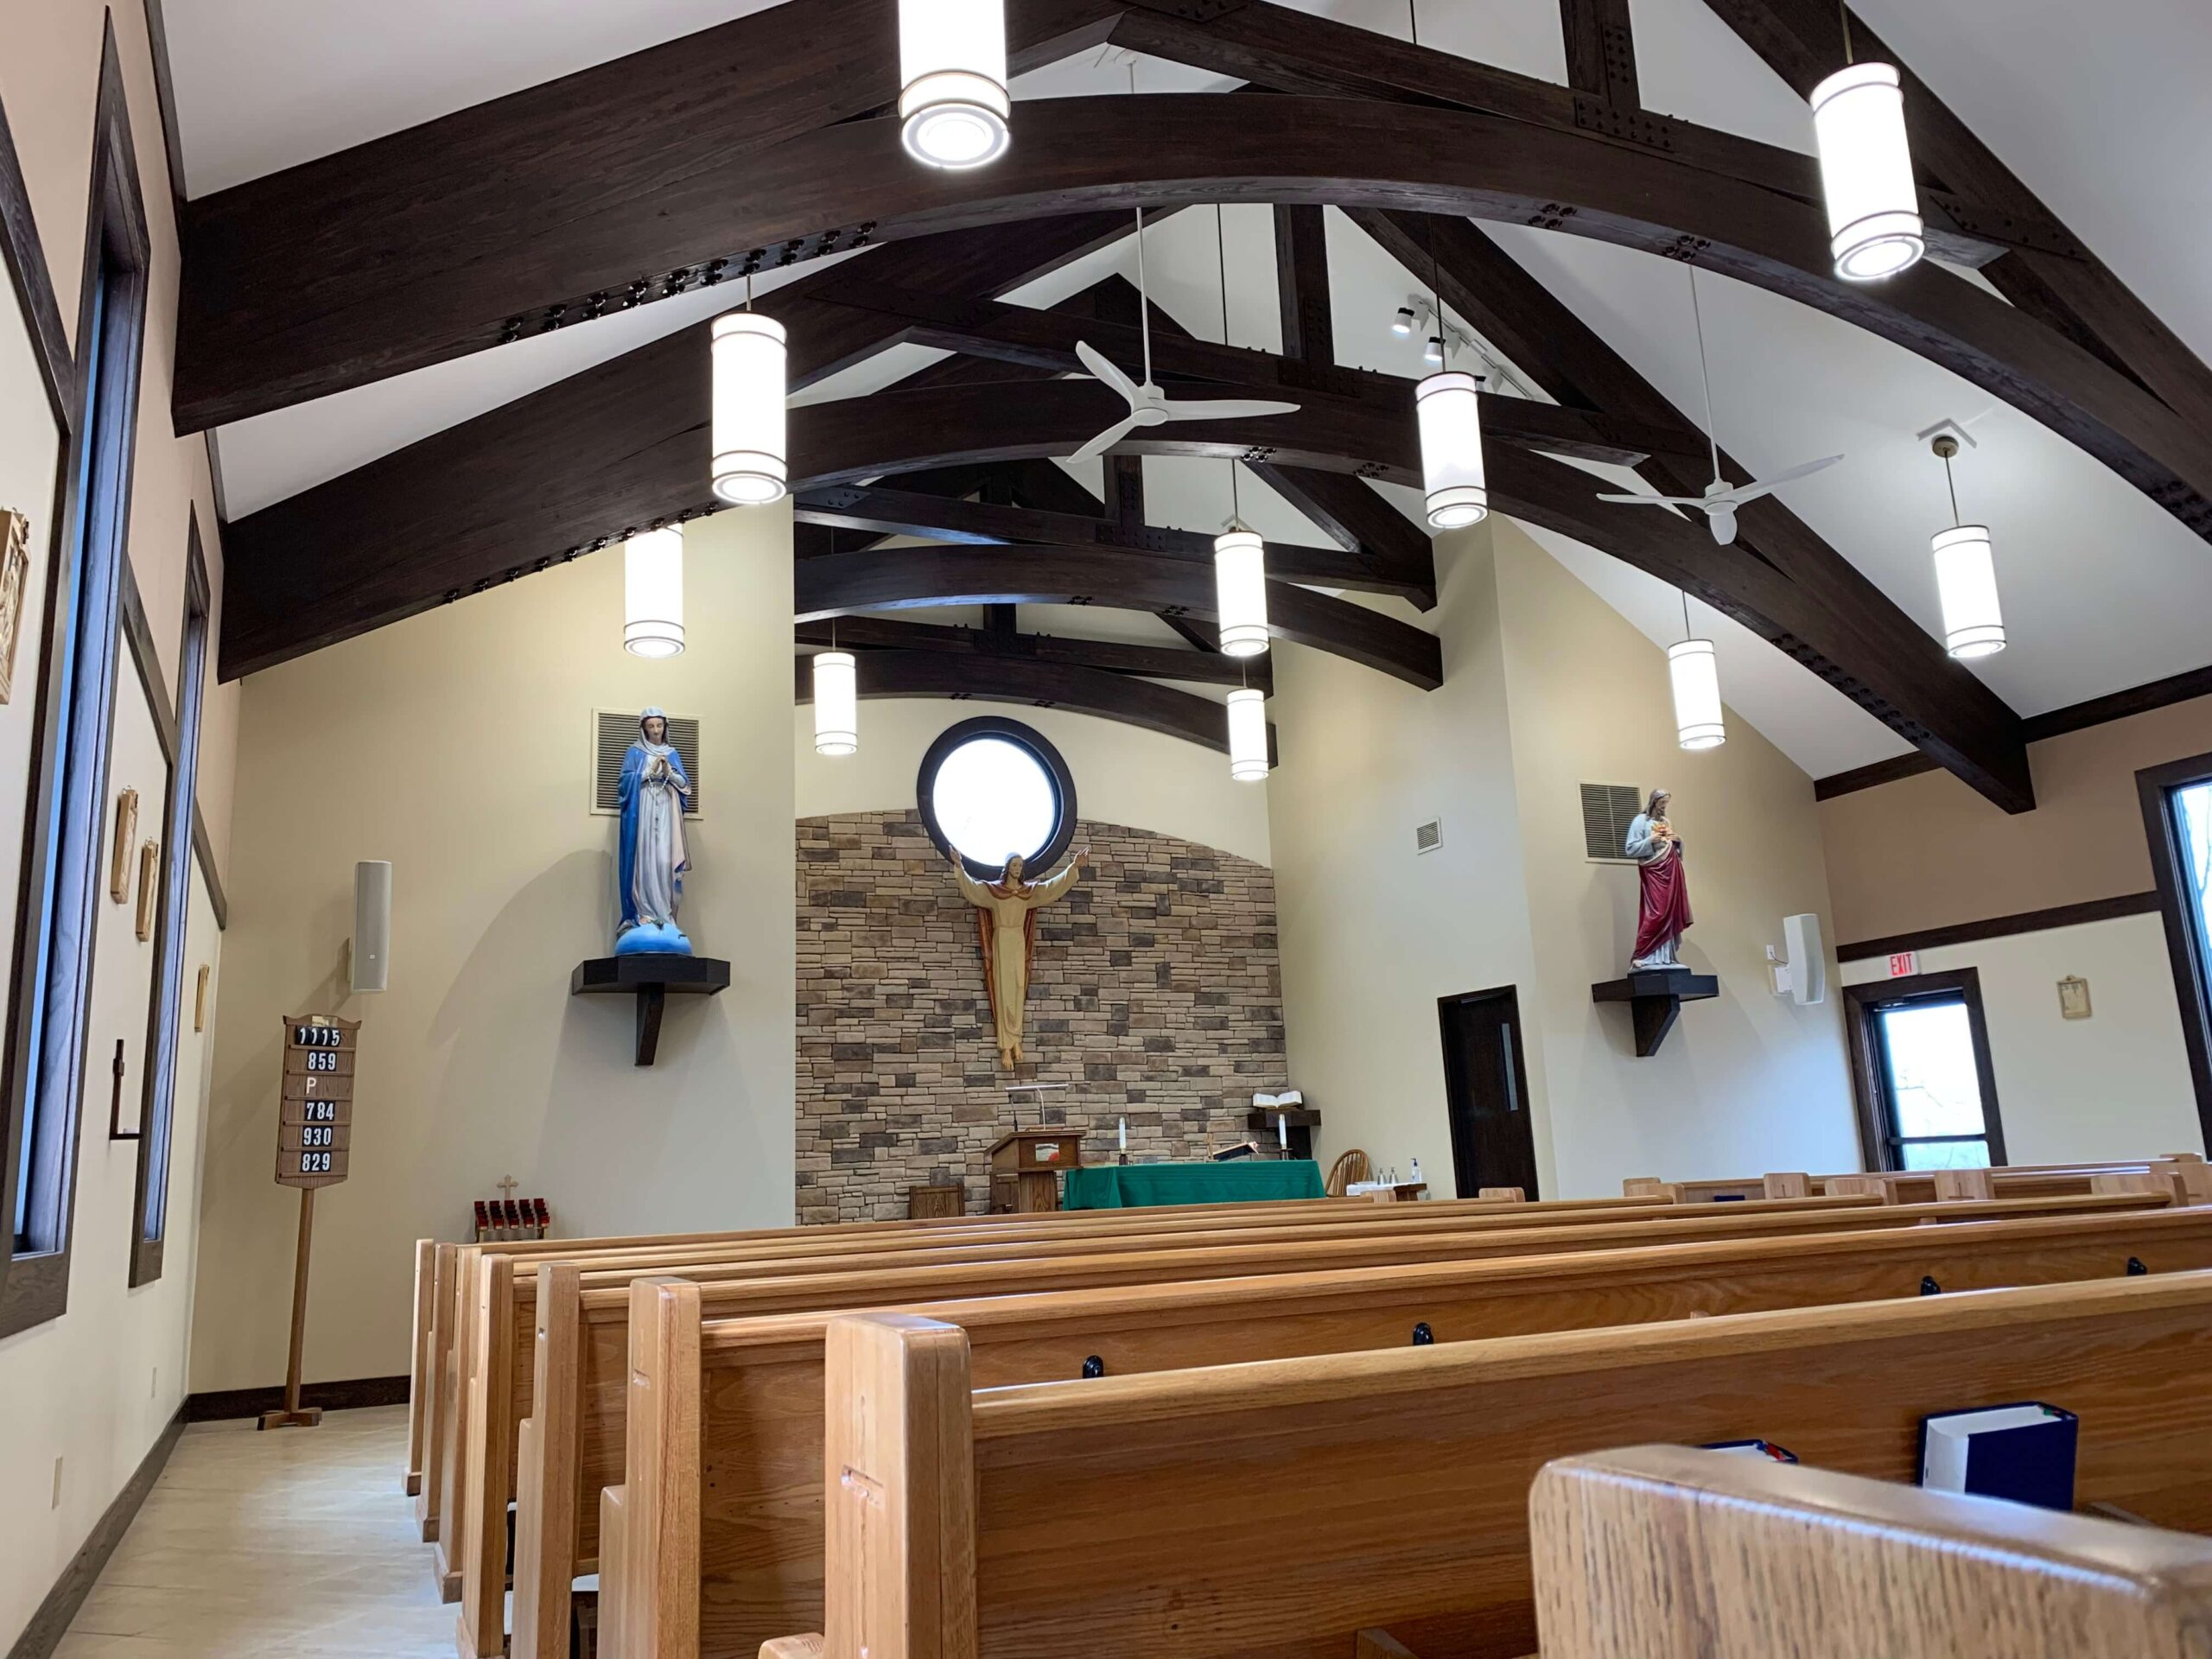 St. Clare Church